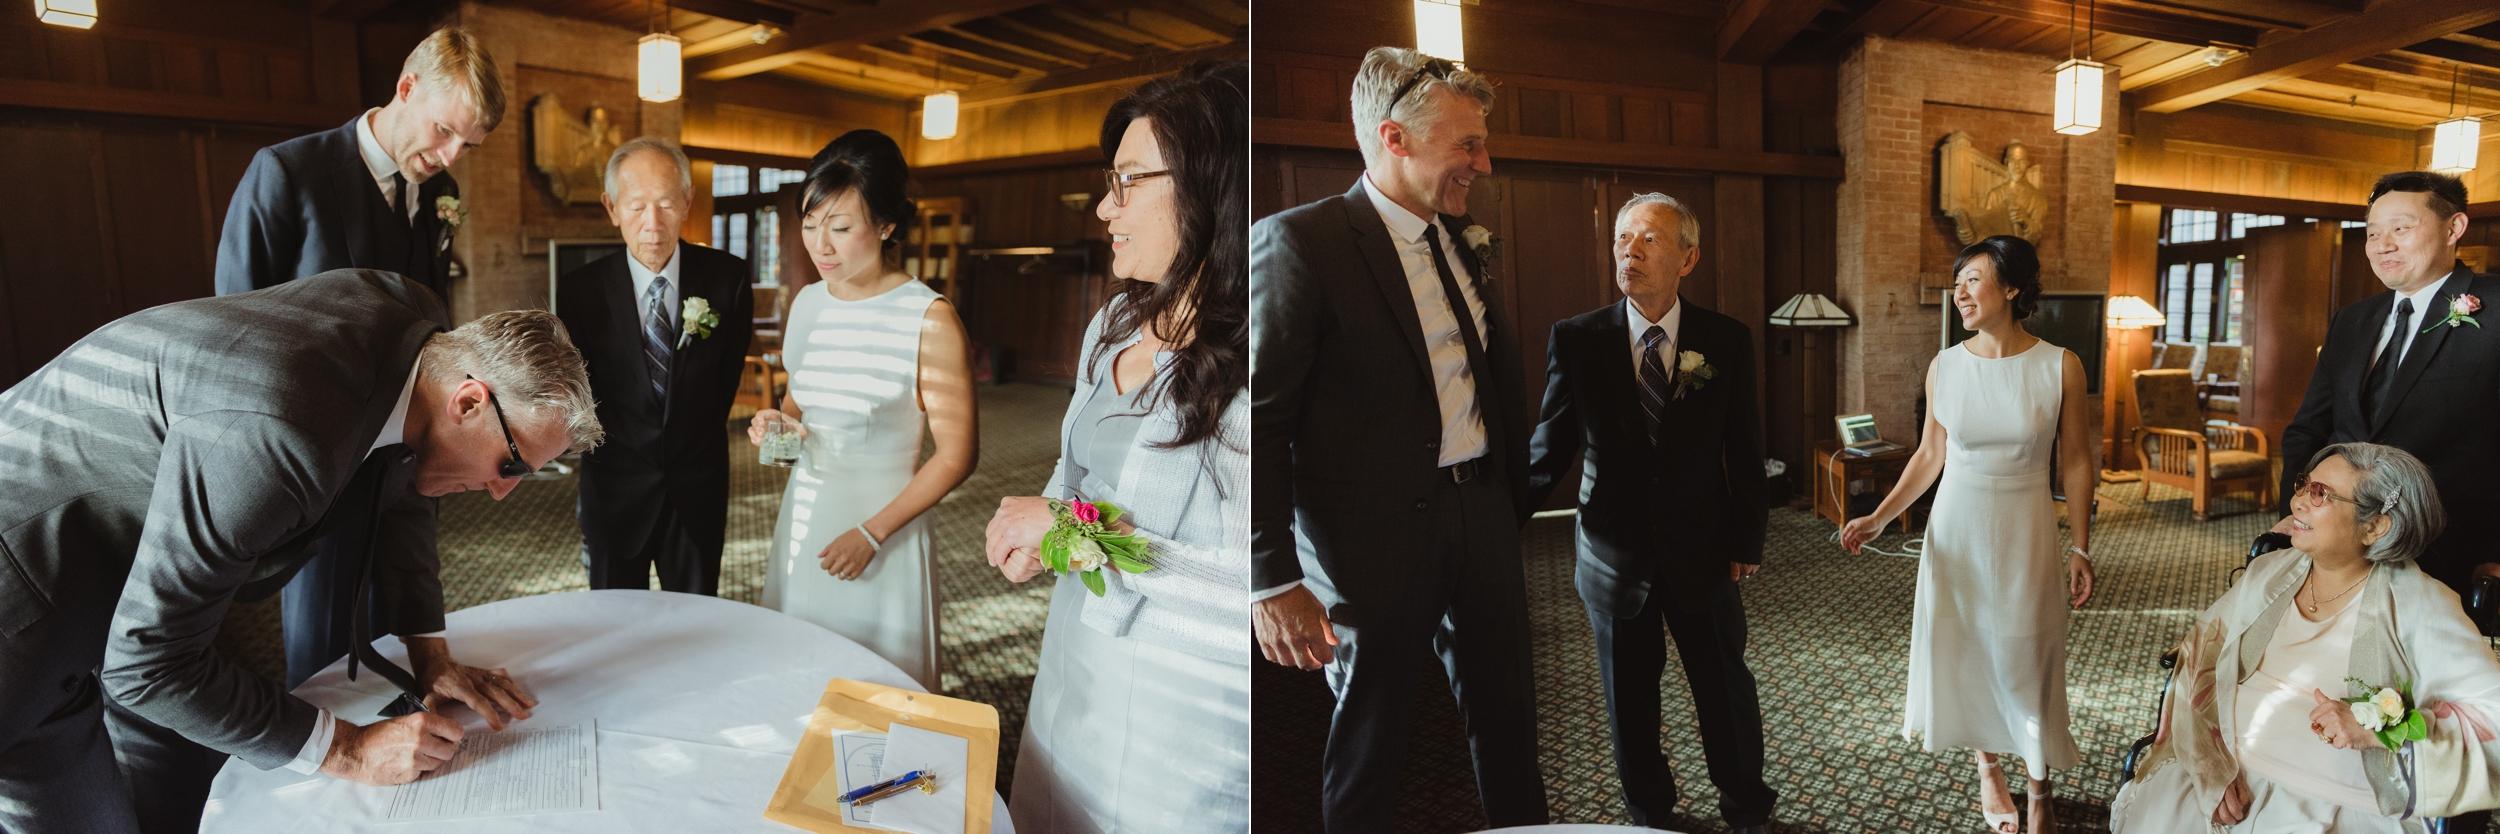 faculty-club-berkeley-wedding-photographer-vc054.jpg